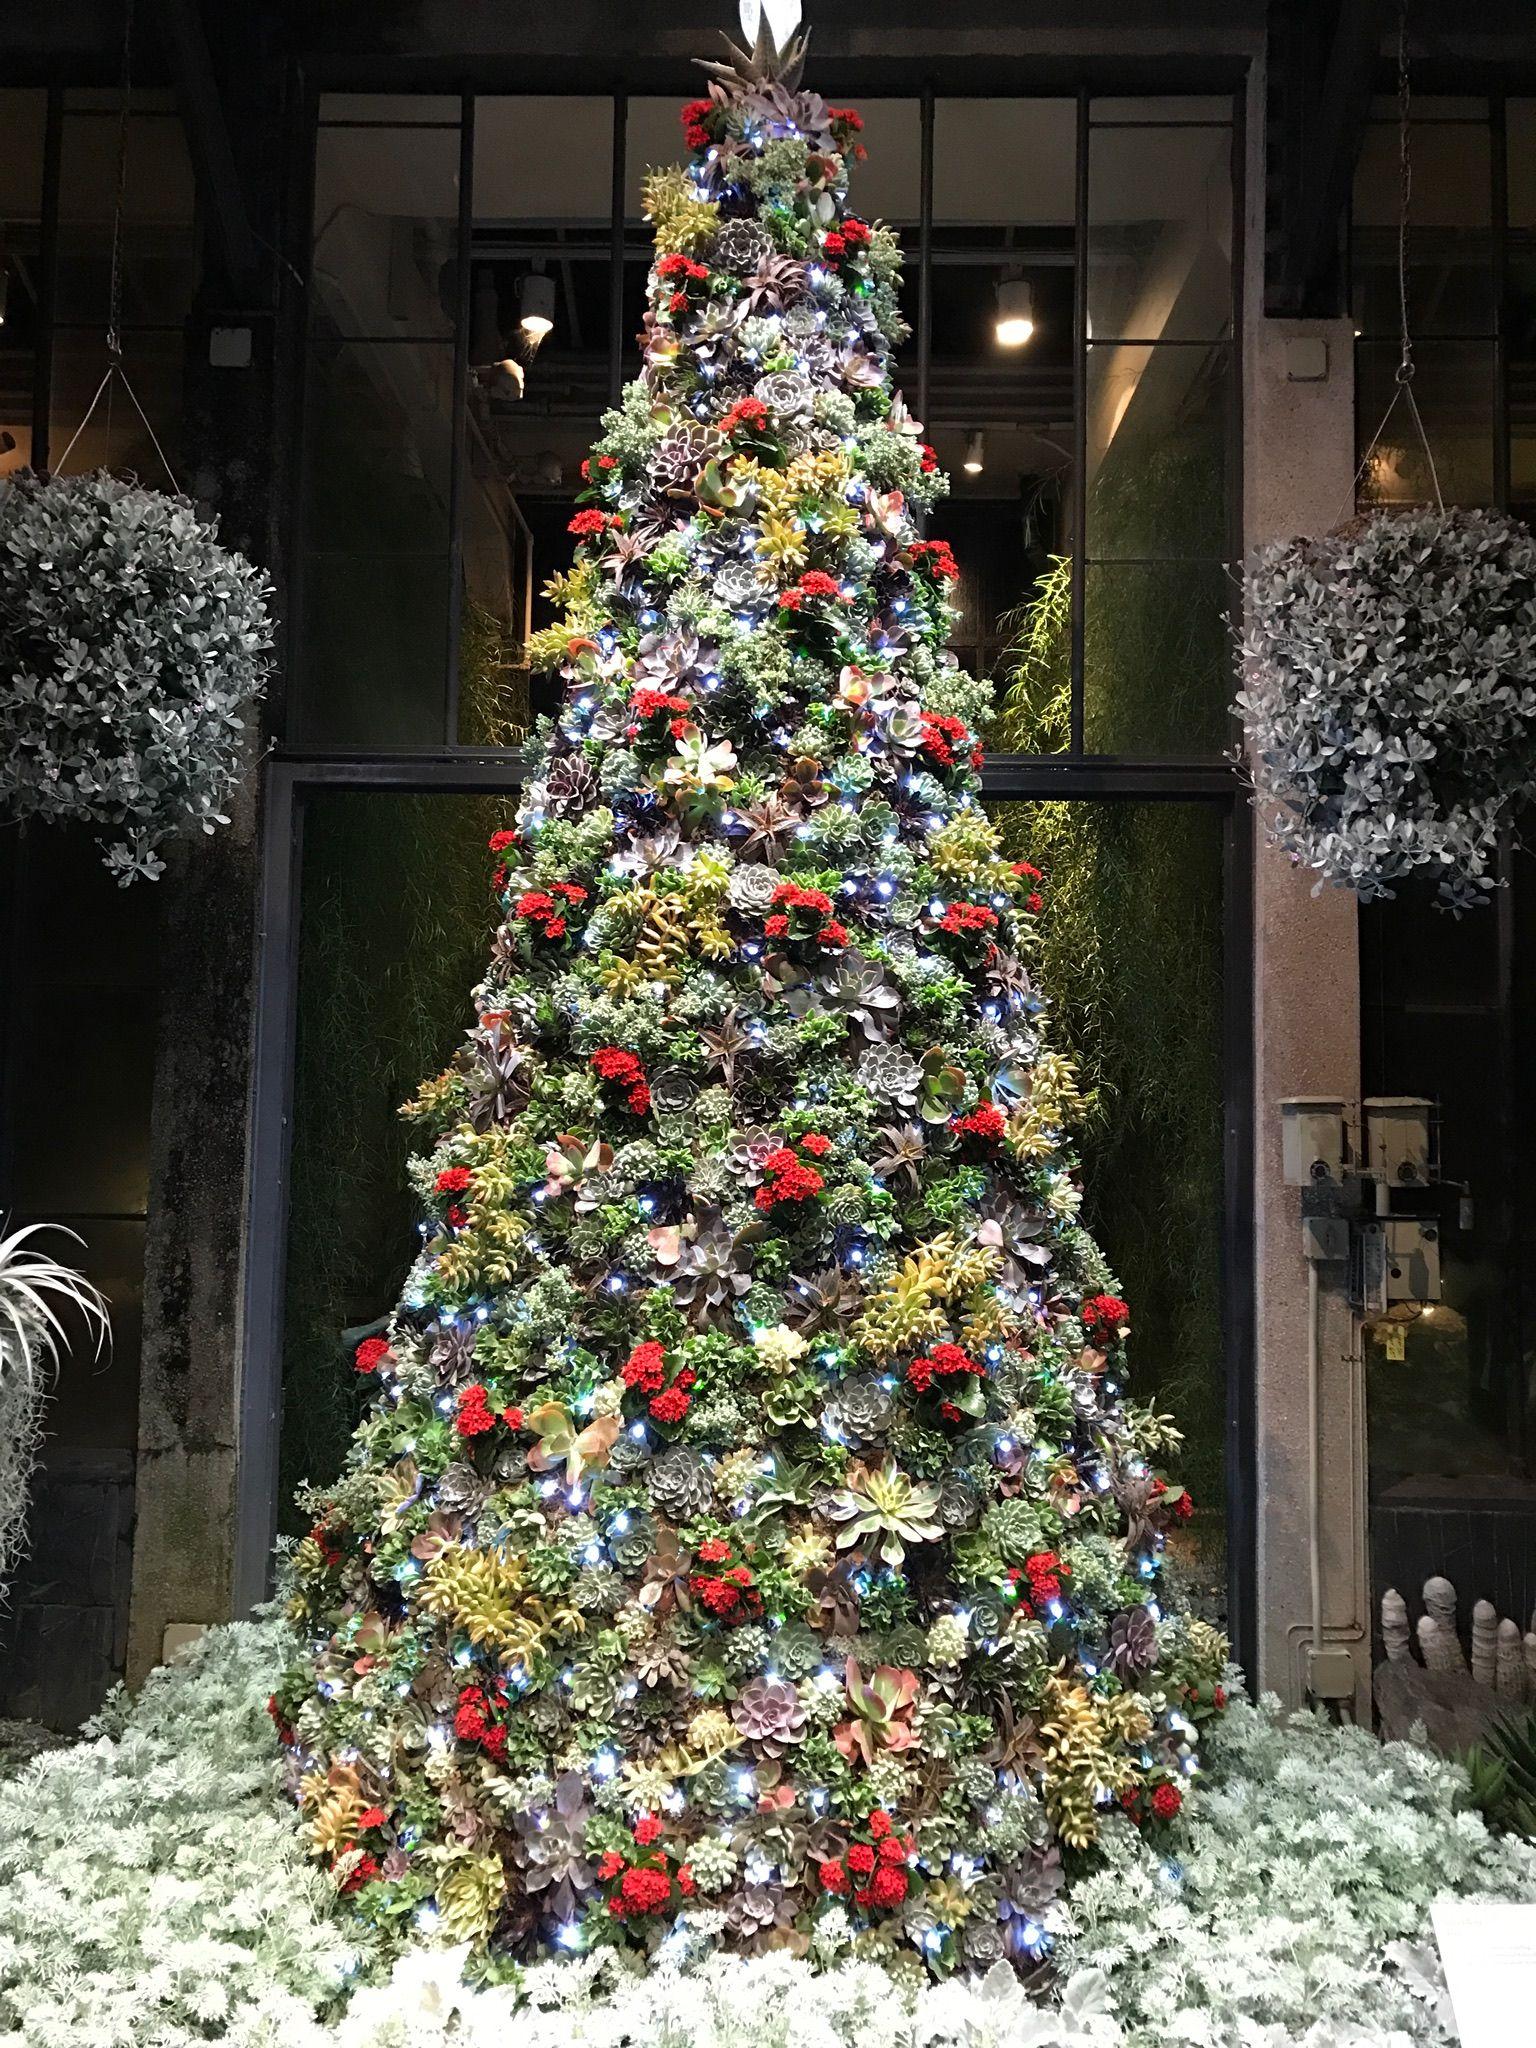 Christmas Tree Made With All Fresh Succulents At Longwood Gardens Pennsylvania Usa Butterfly Garden Design Vegetable Garden Design Backyard Design